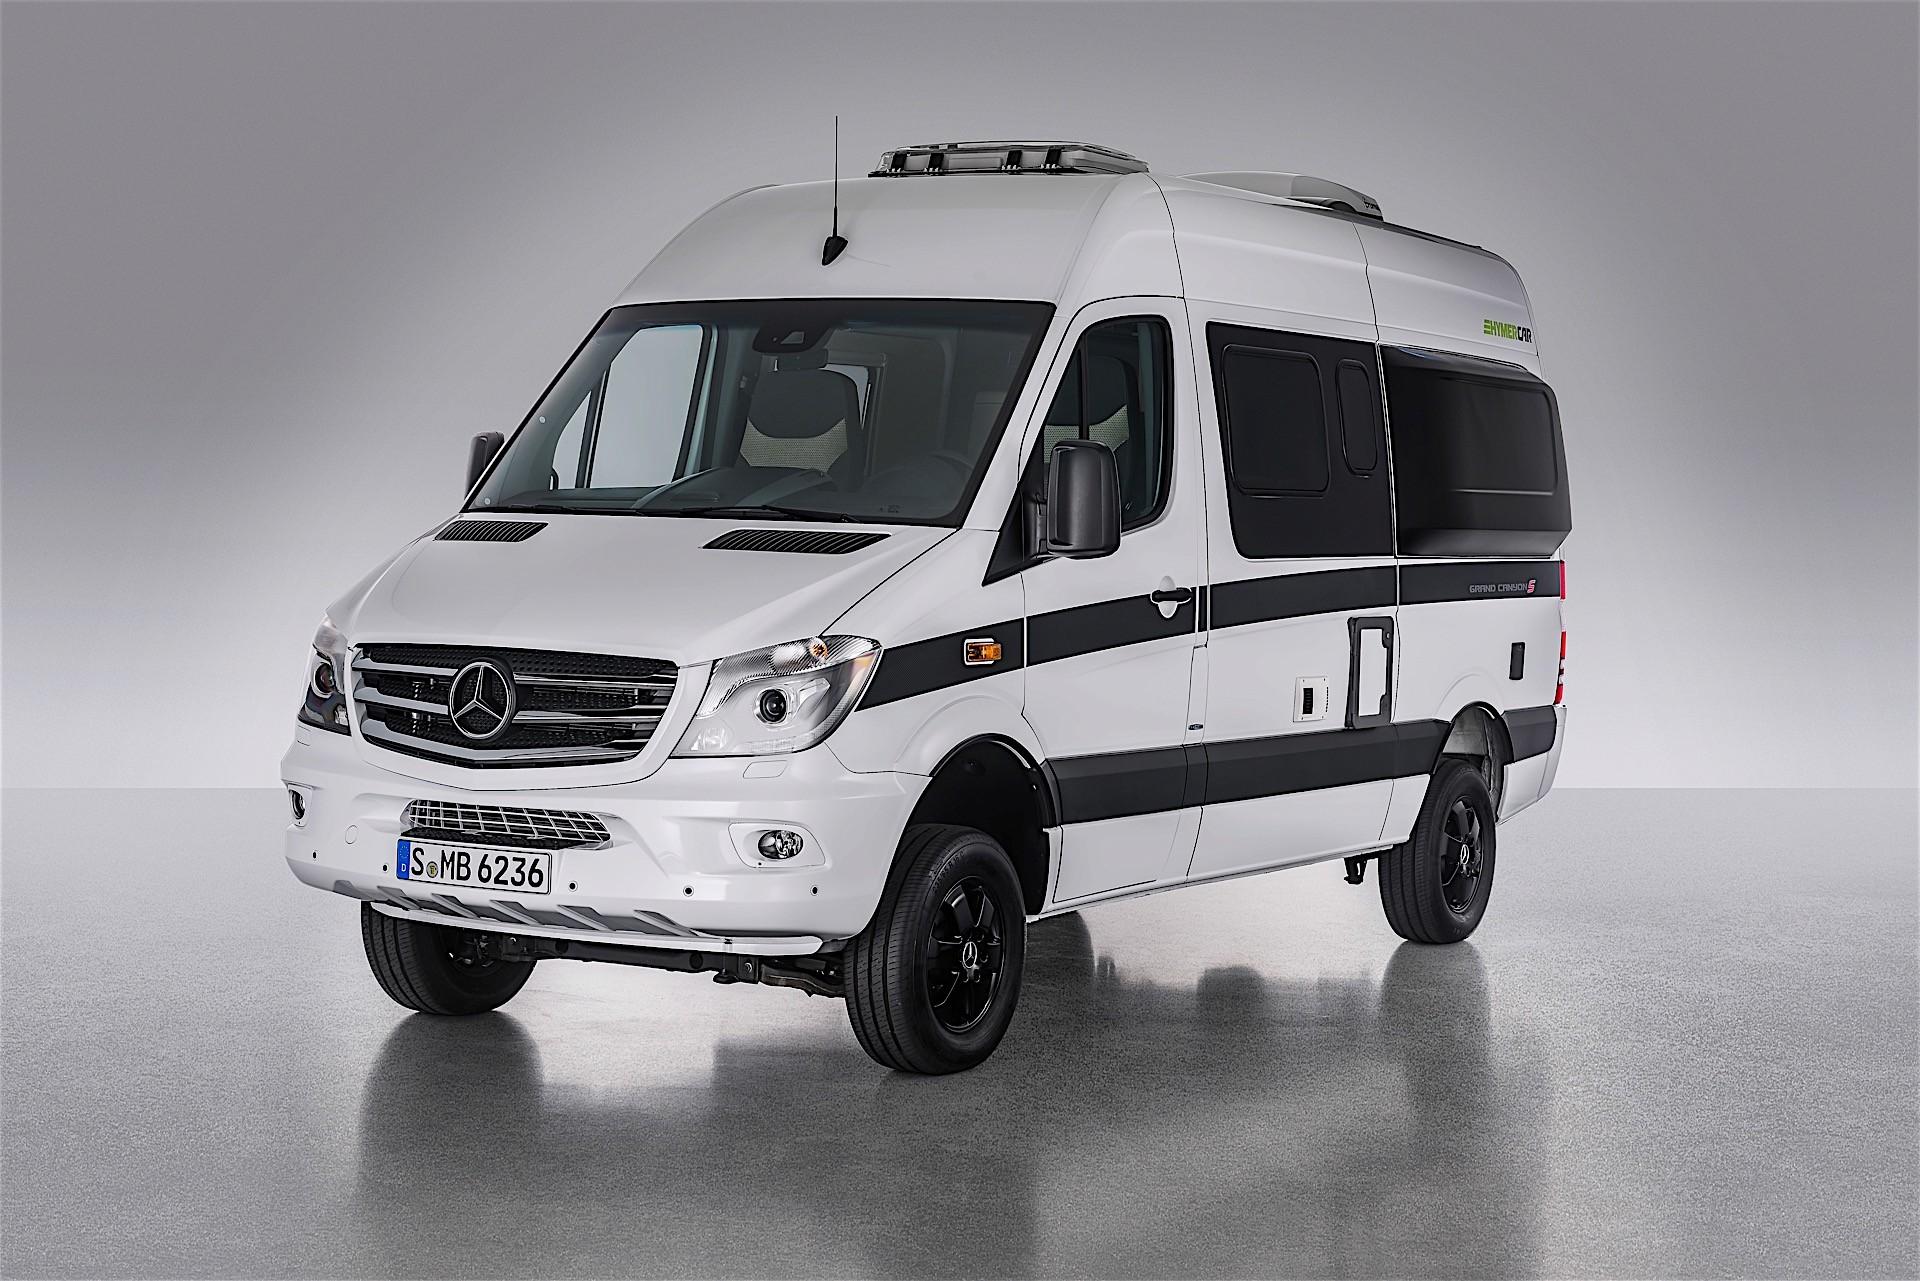 Mercedes benz unveils exhibits for 2016 caravan salon for Camper mercedes